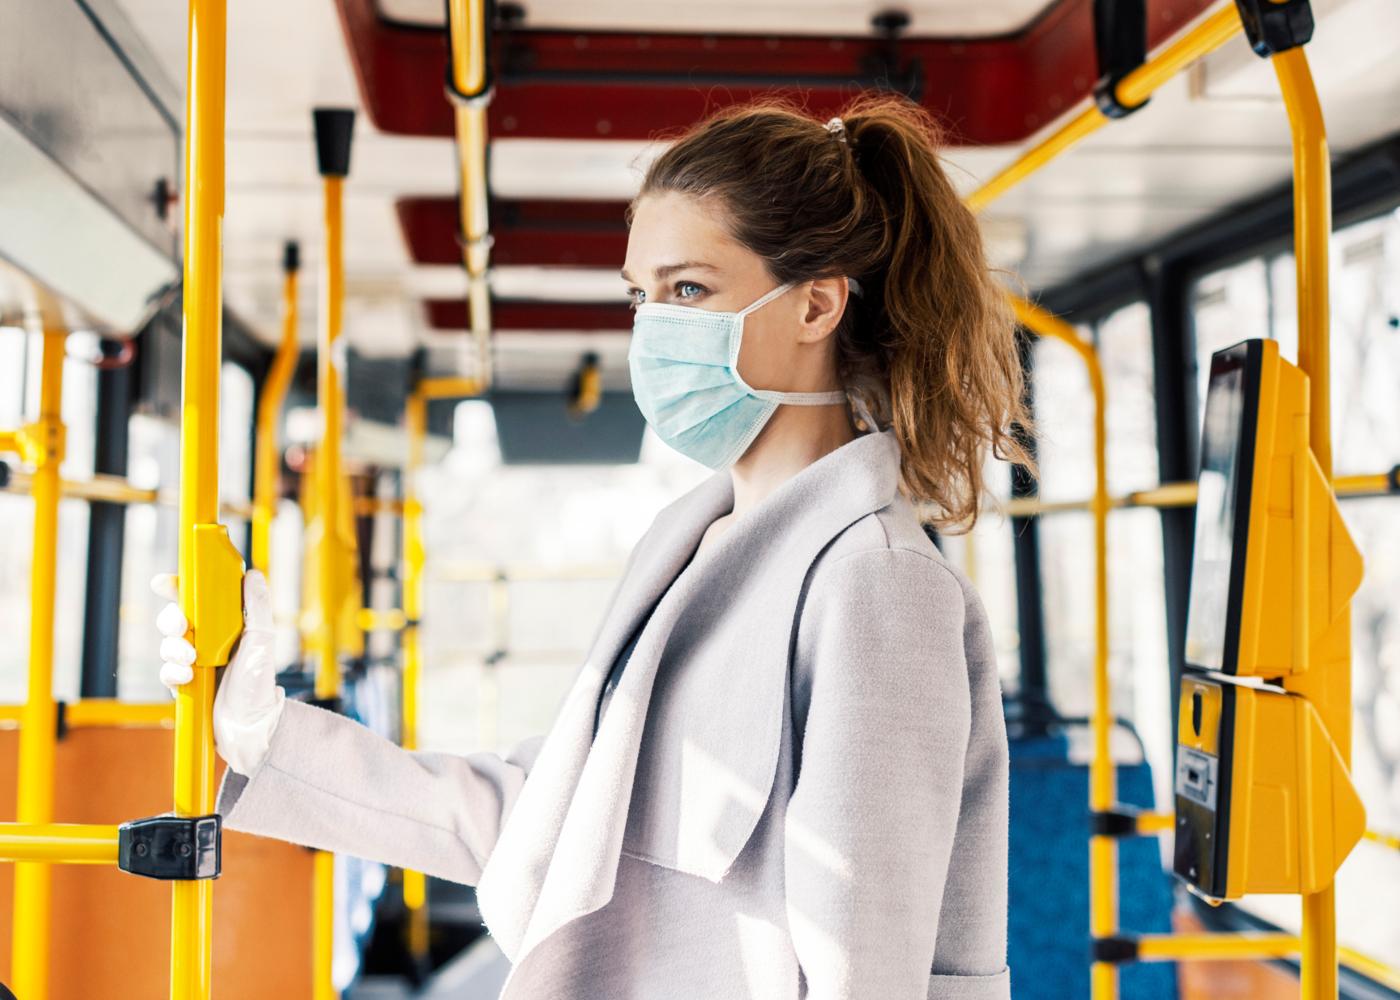 Mulher a usar máscara no autocarro